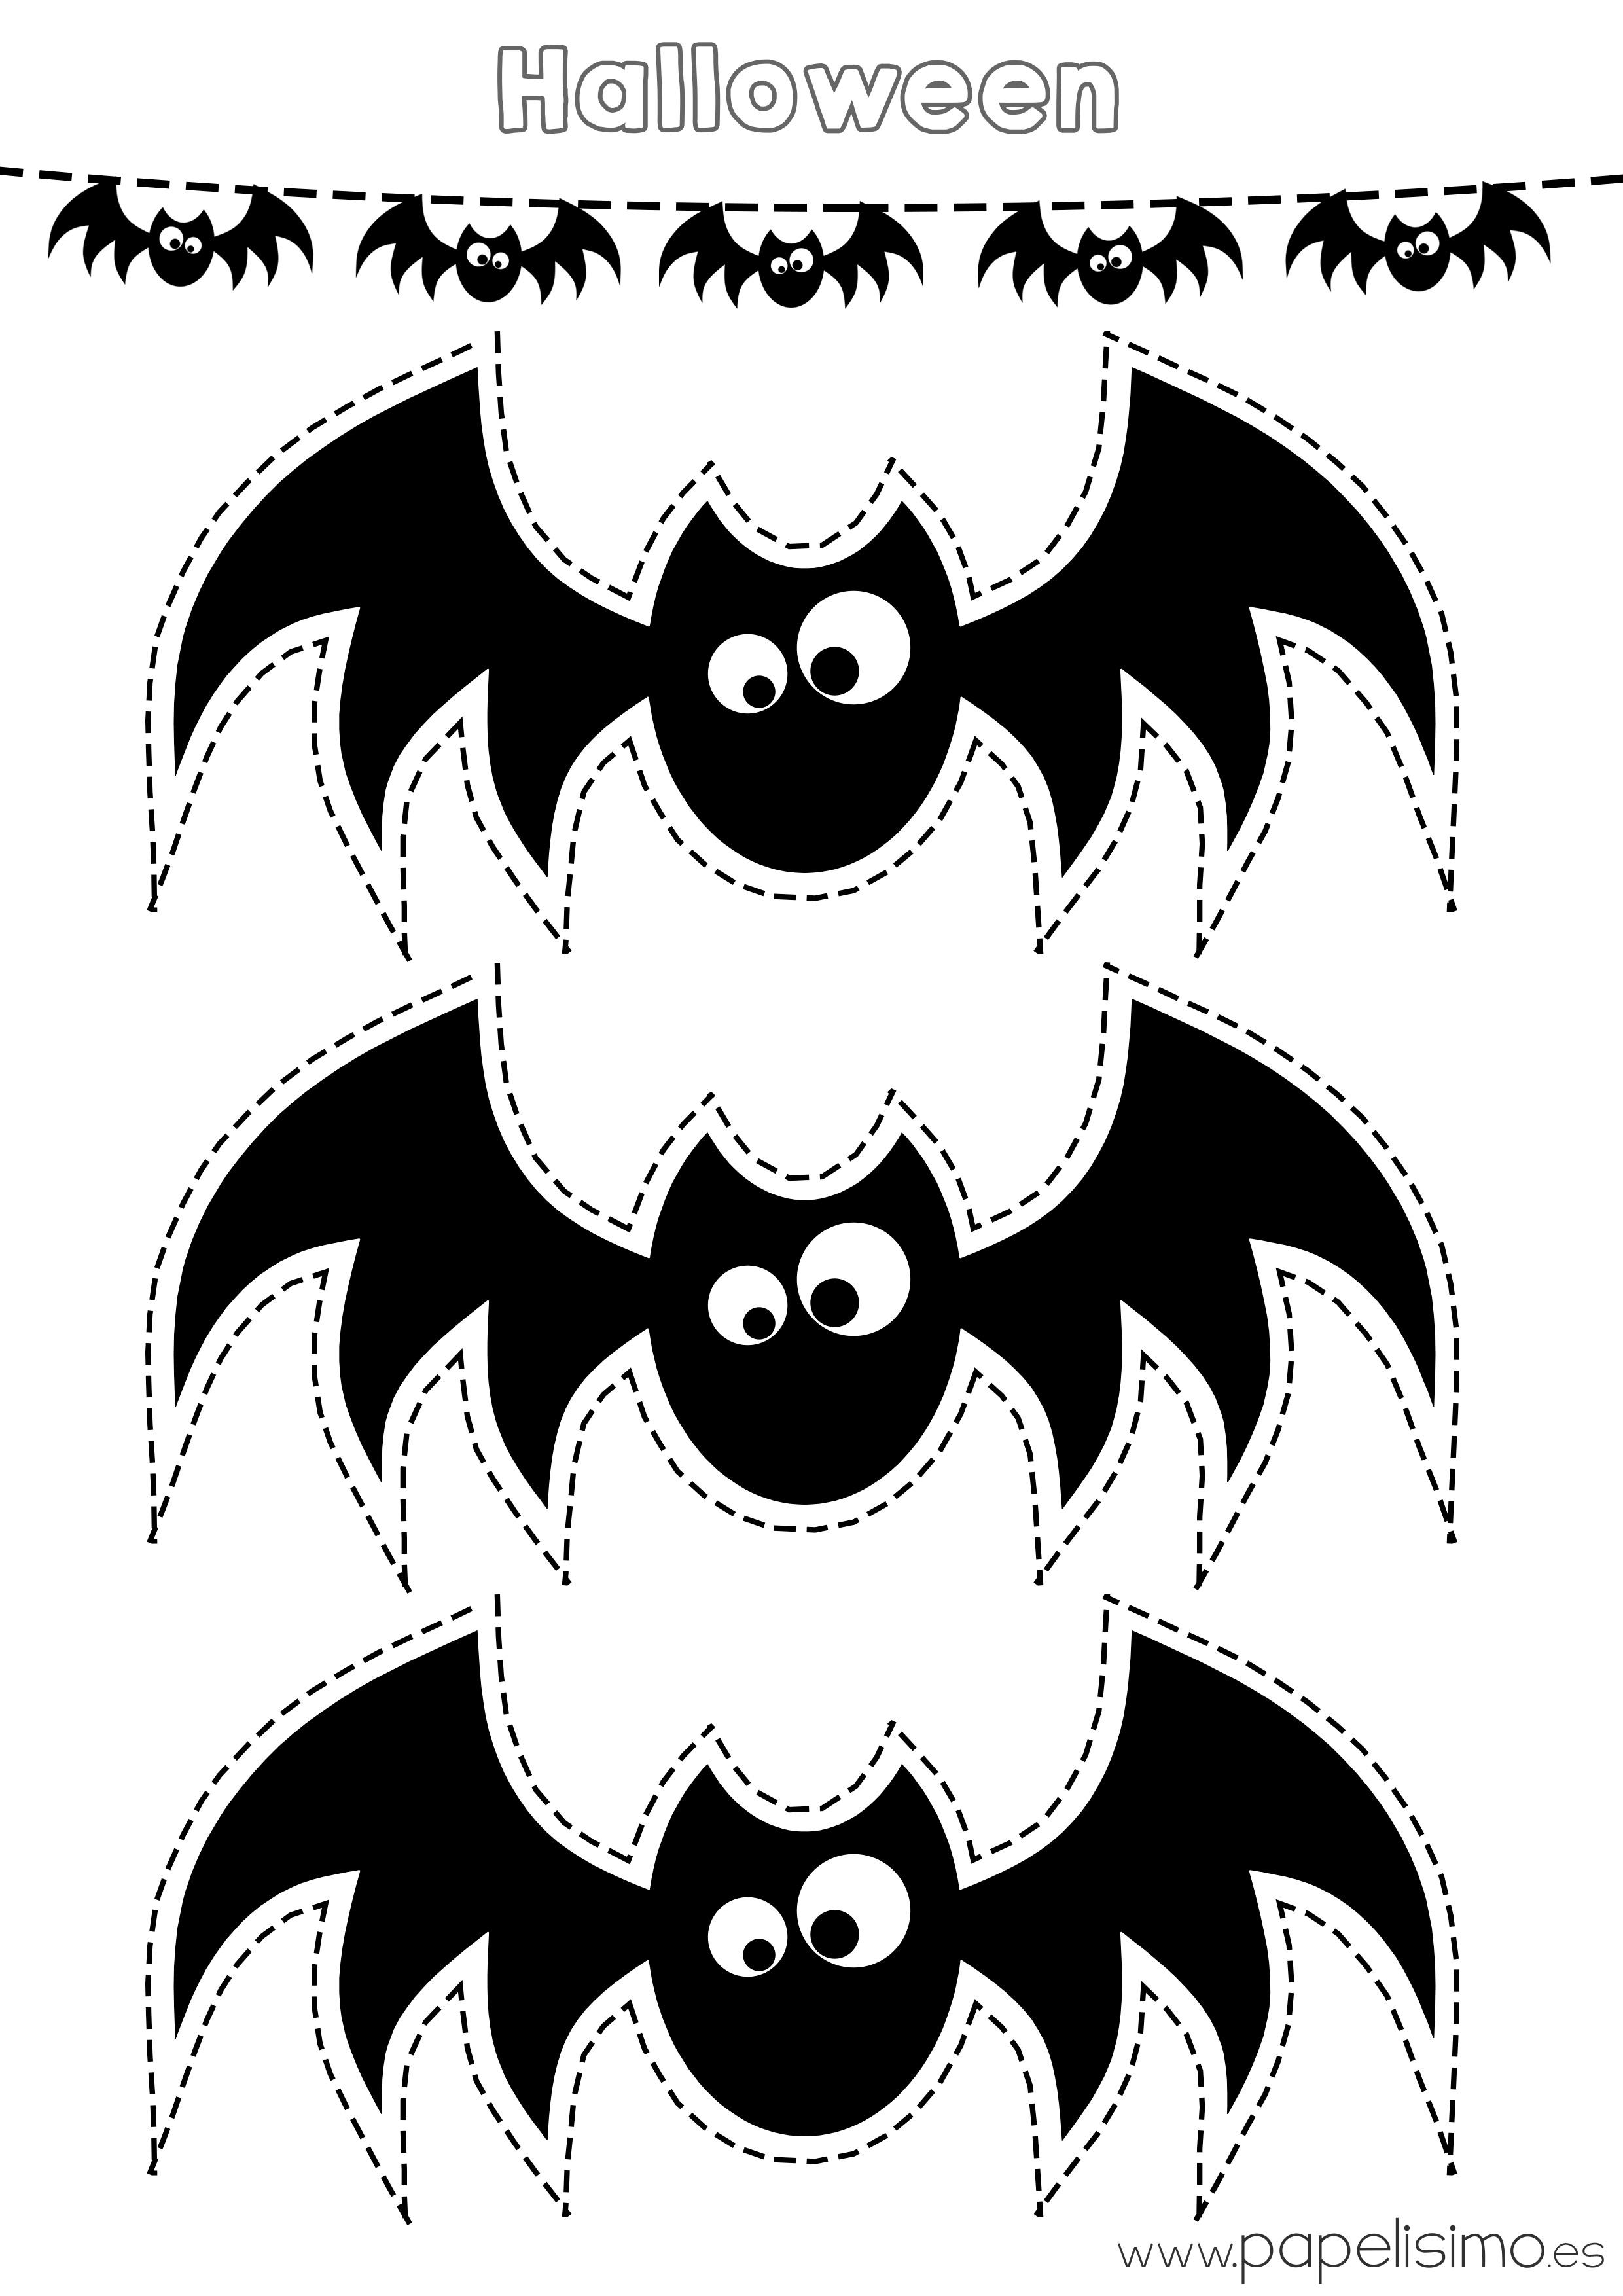 siluetas de murci lagos para colorear y recortar papelisimo On murcielagos halloween para imprimir